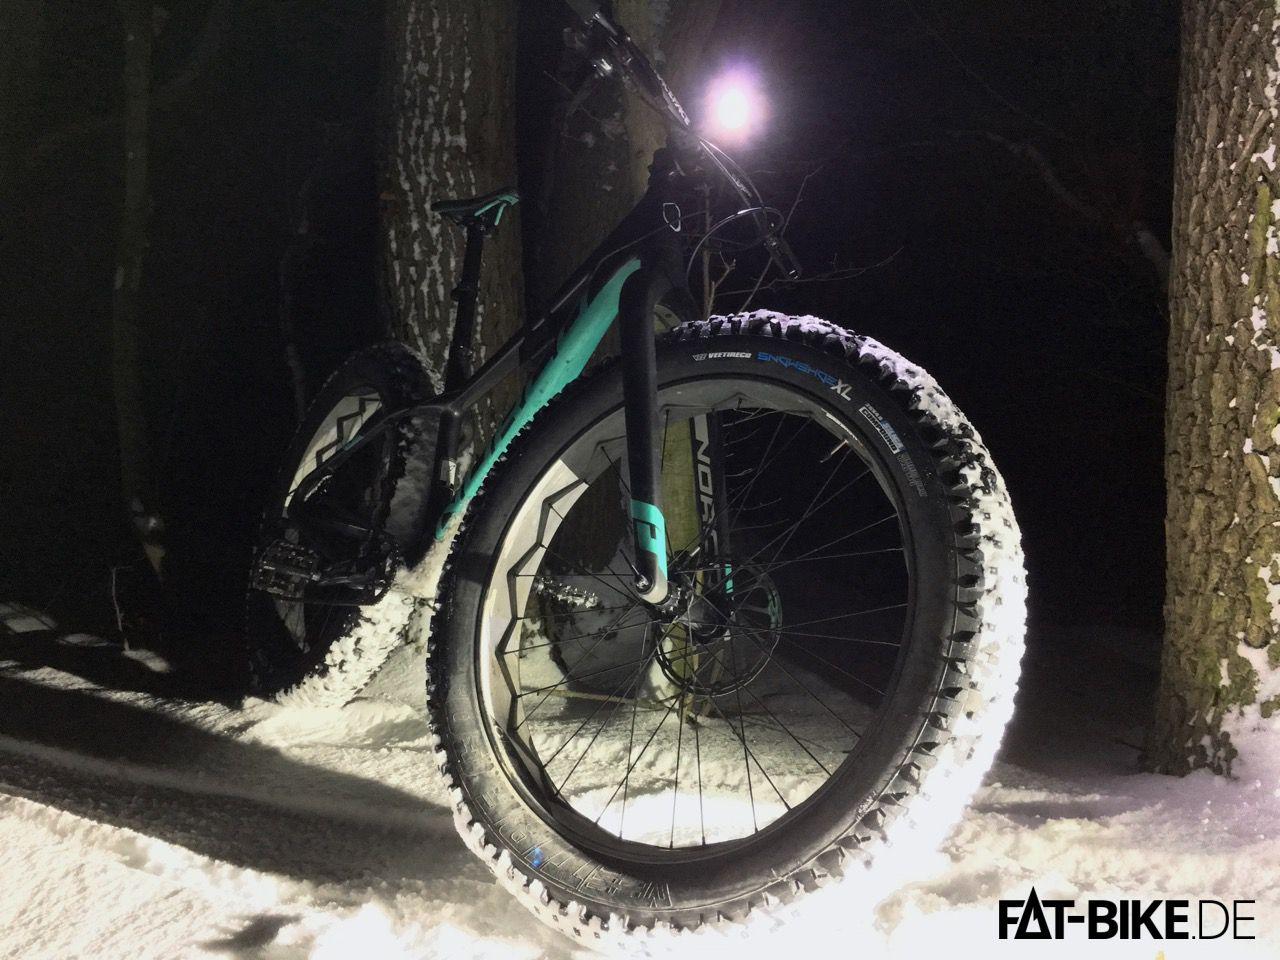 Niteride mit dem Vee Tire Snow Shoe XL